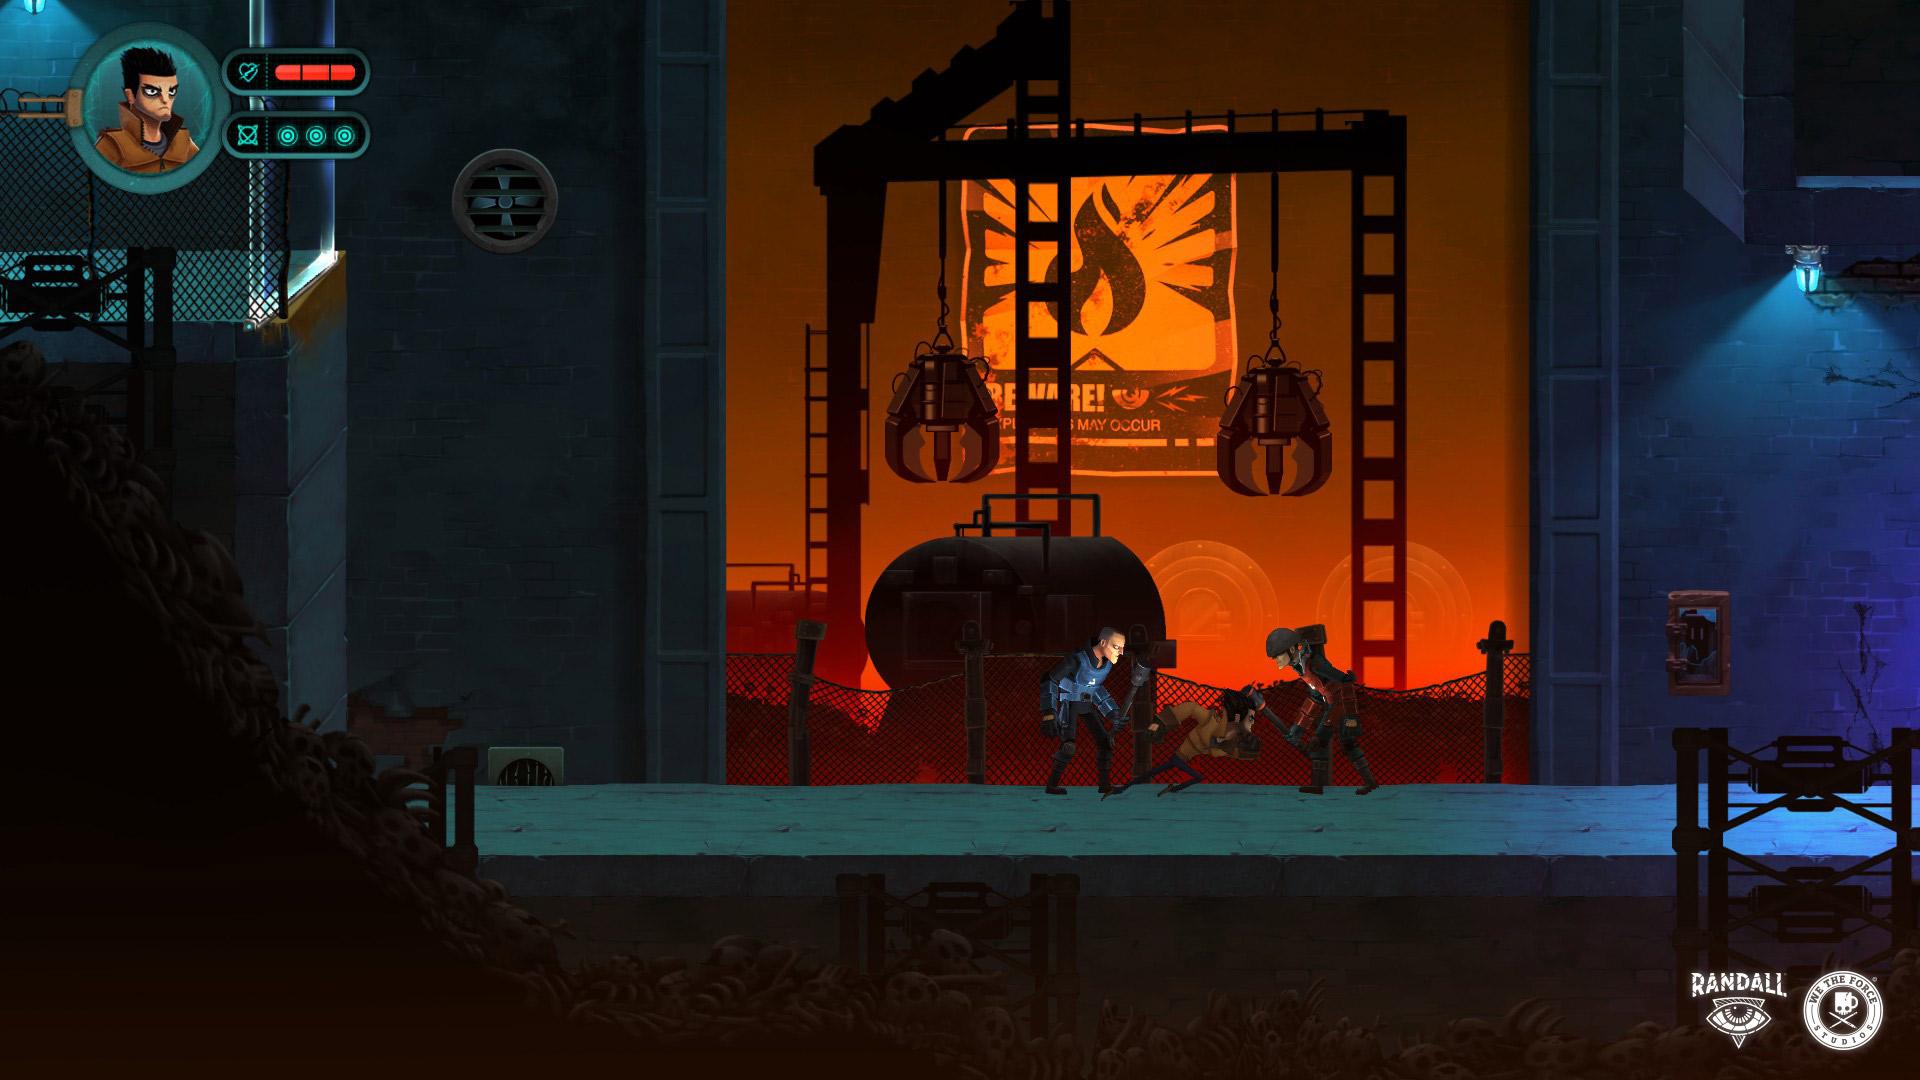 Randall Screenshot 1